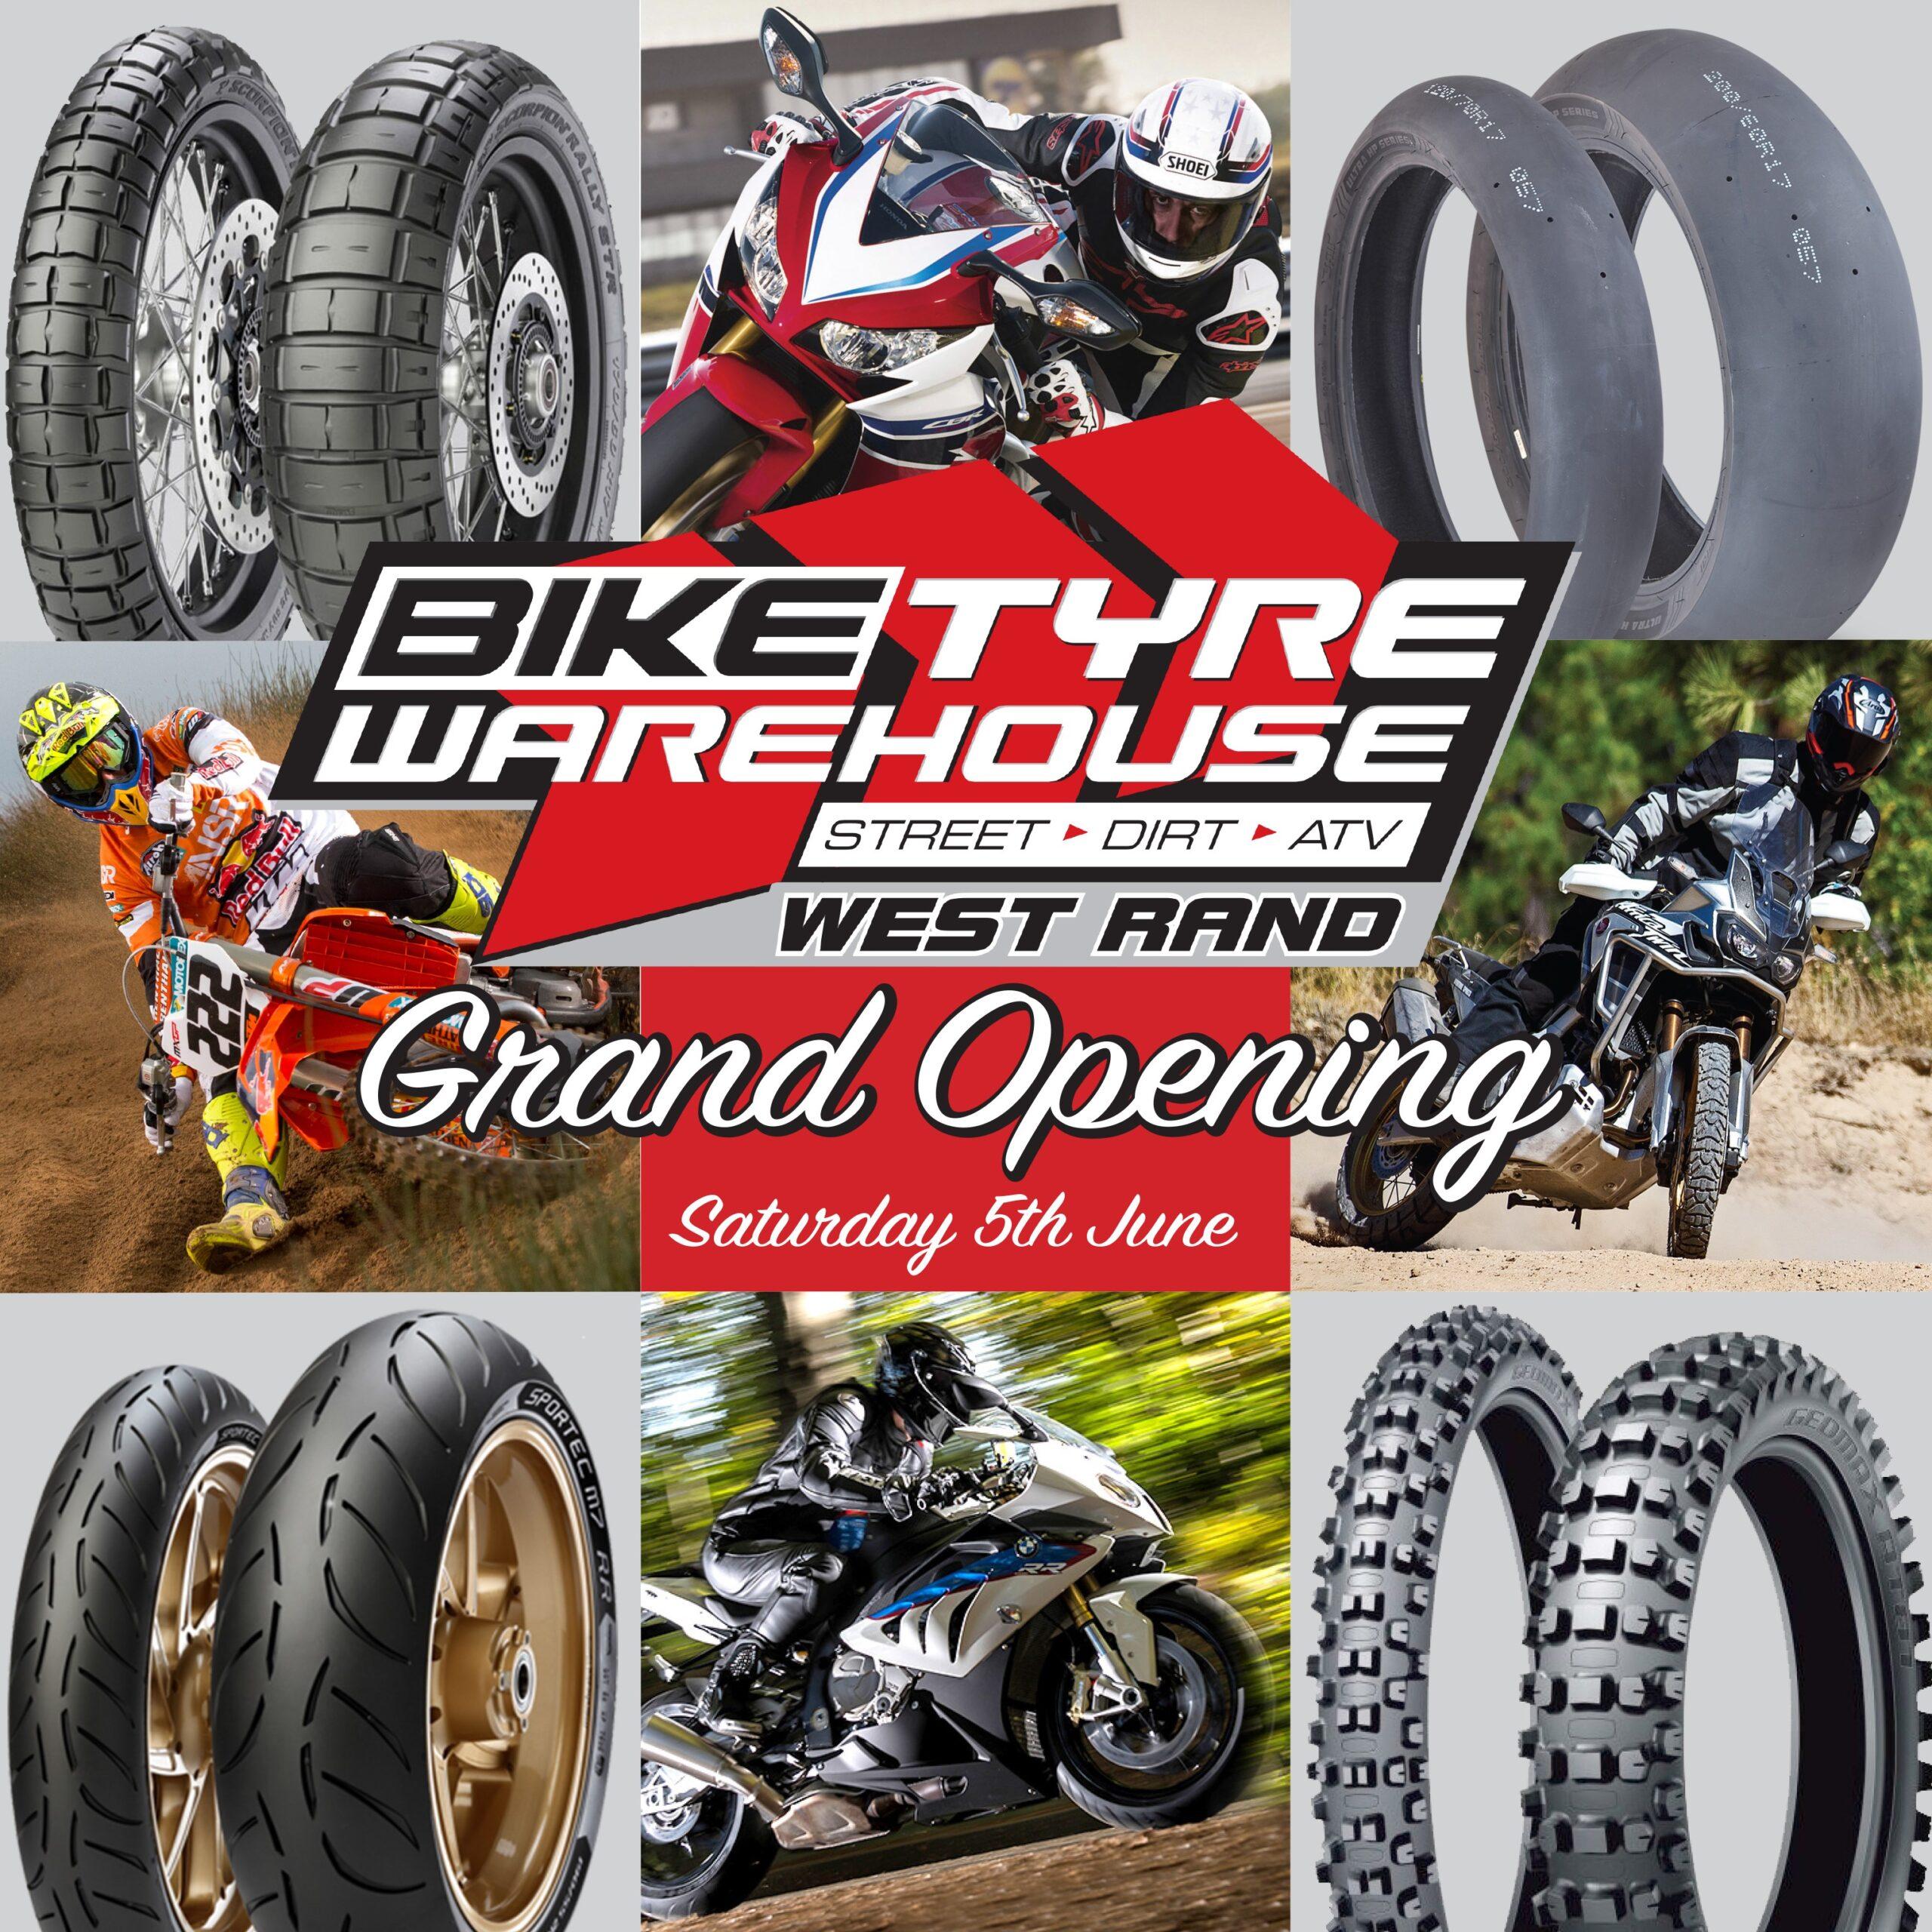 Bike Tyre Warehouse West Rand Opening